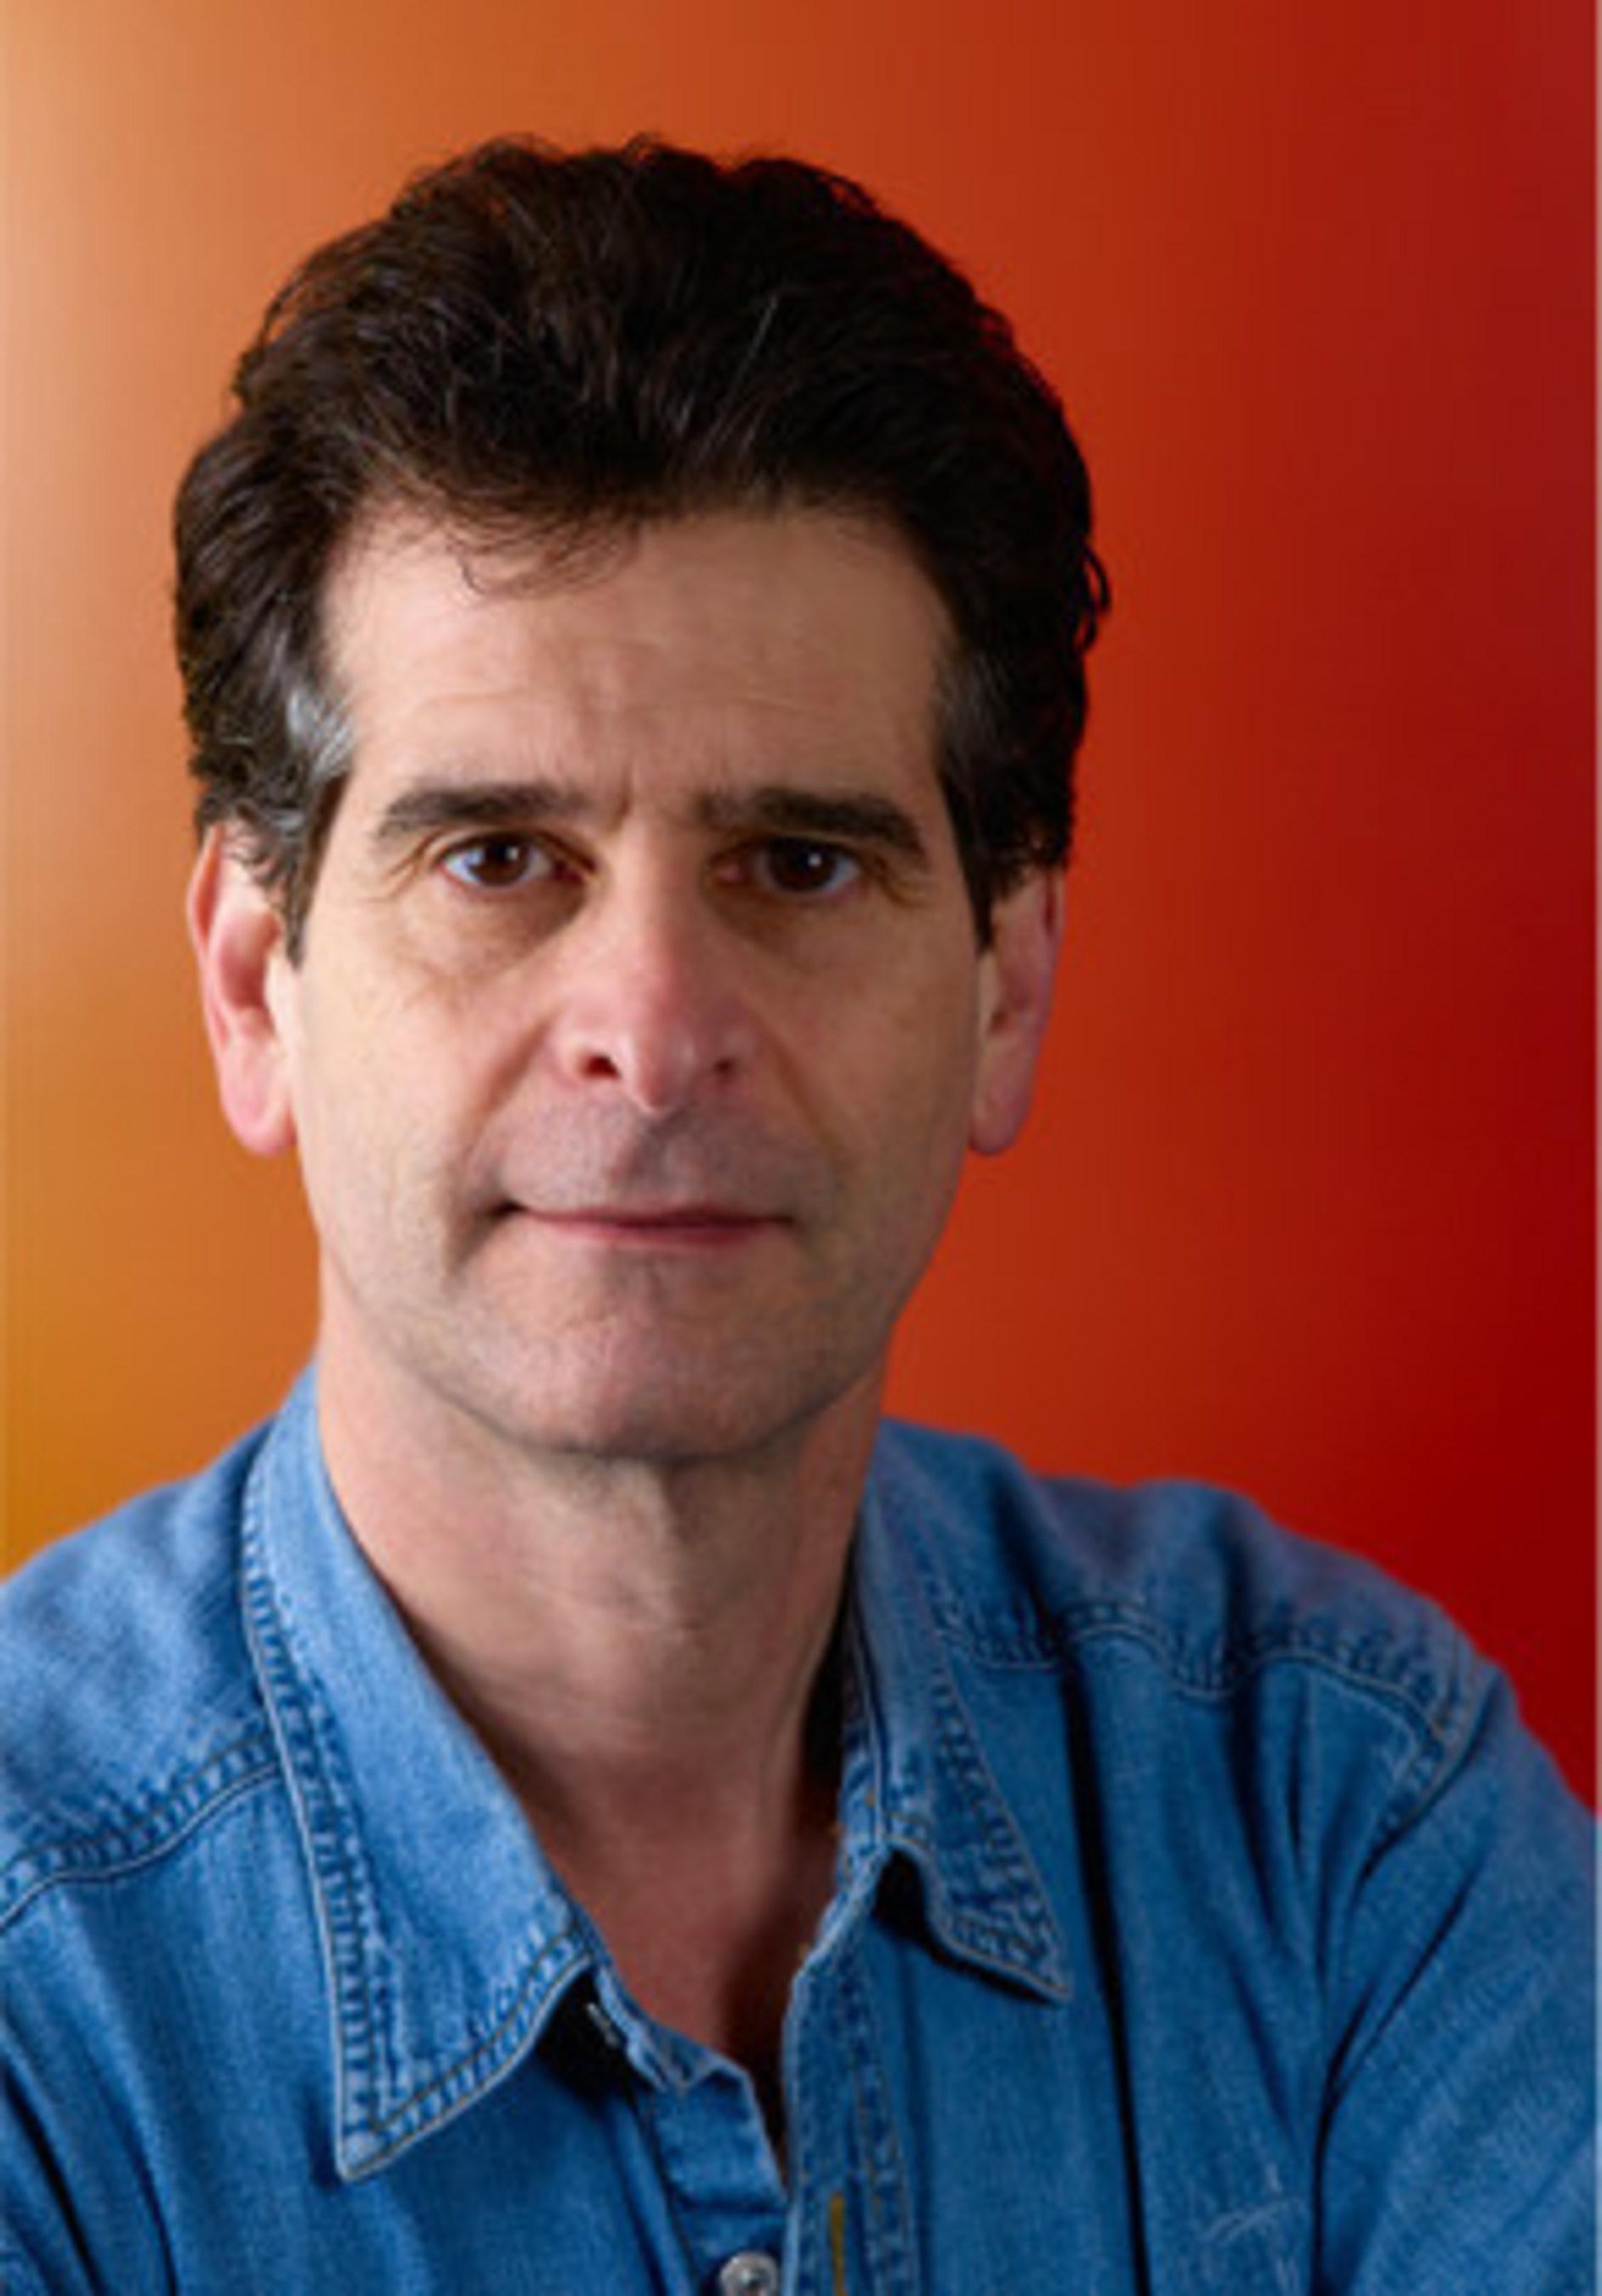 Dean Kamen speaks on The Luke Arm at Boston event May 6, 2015